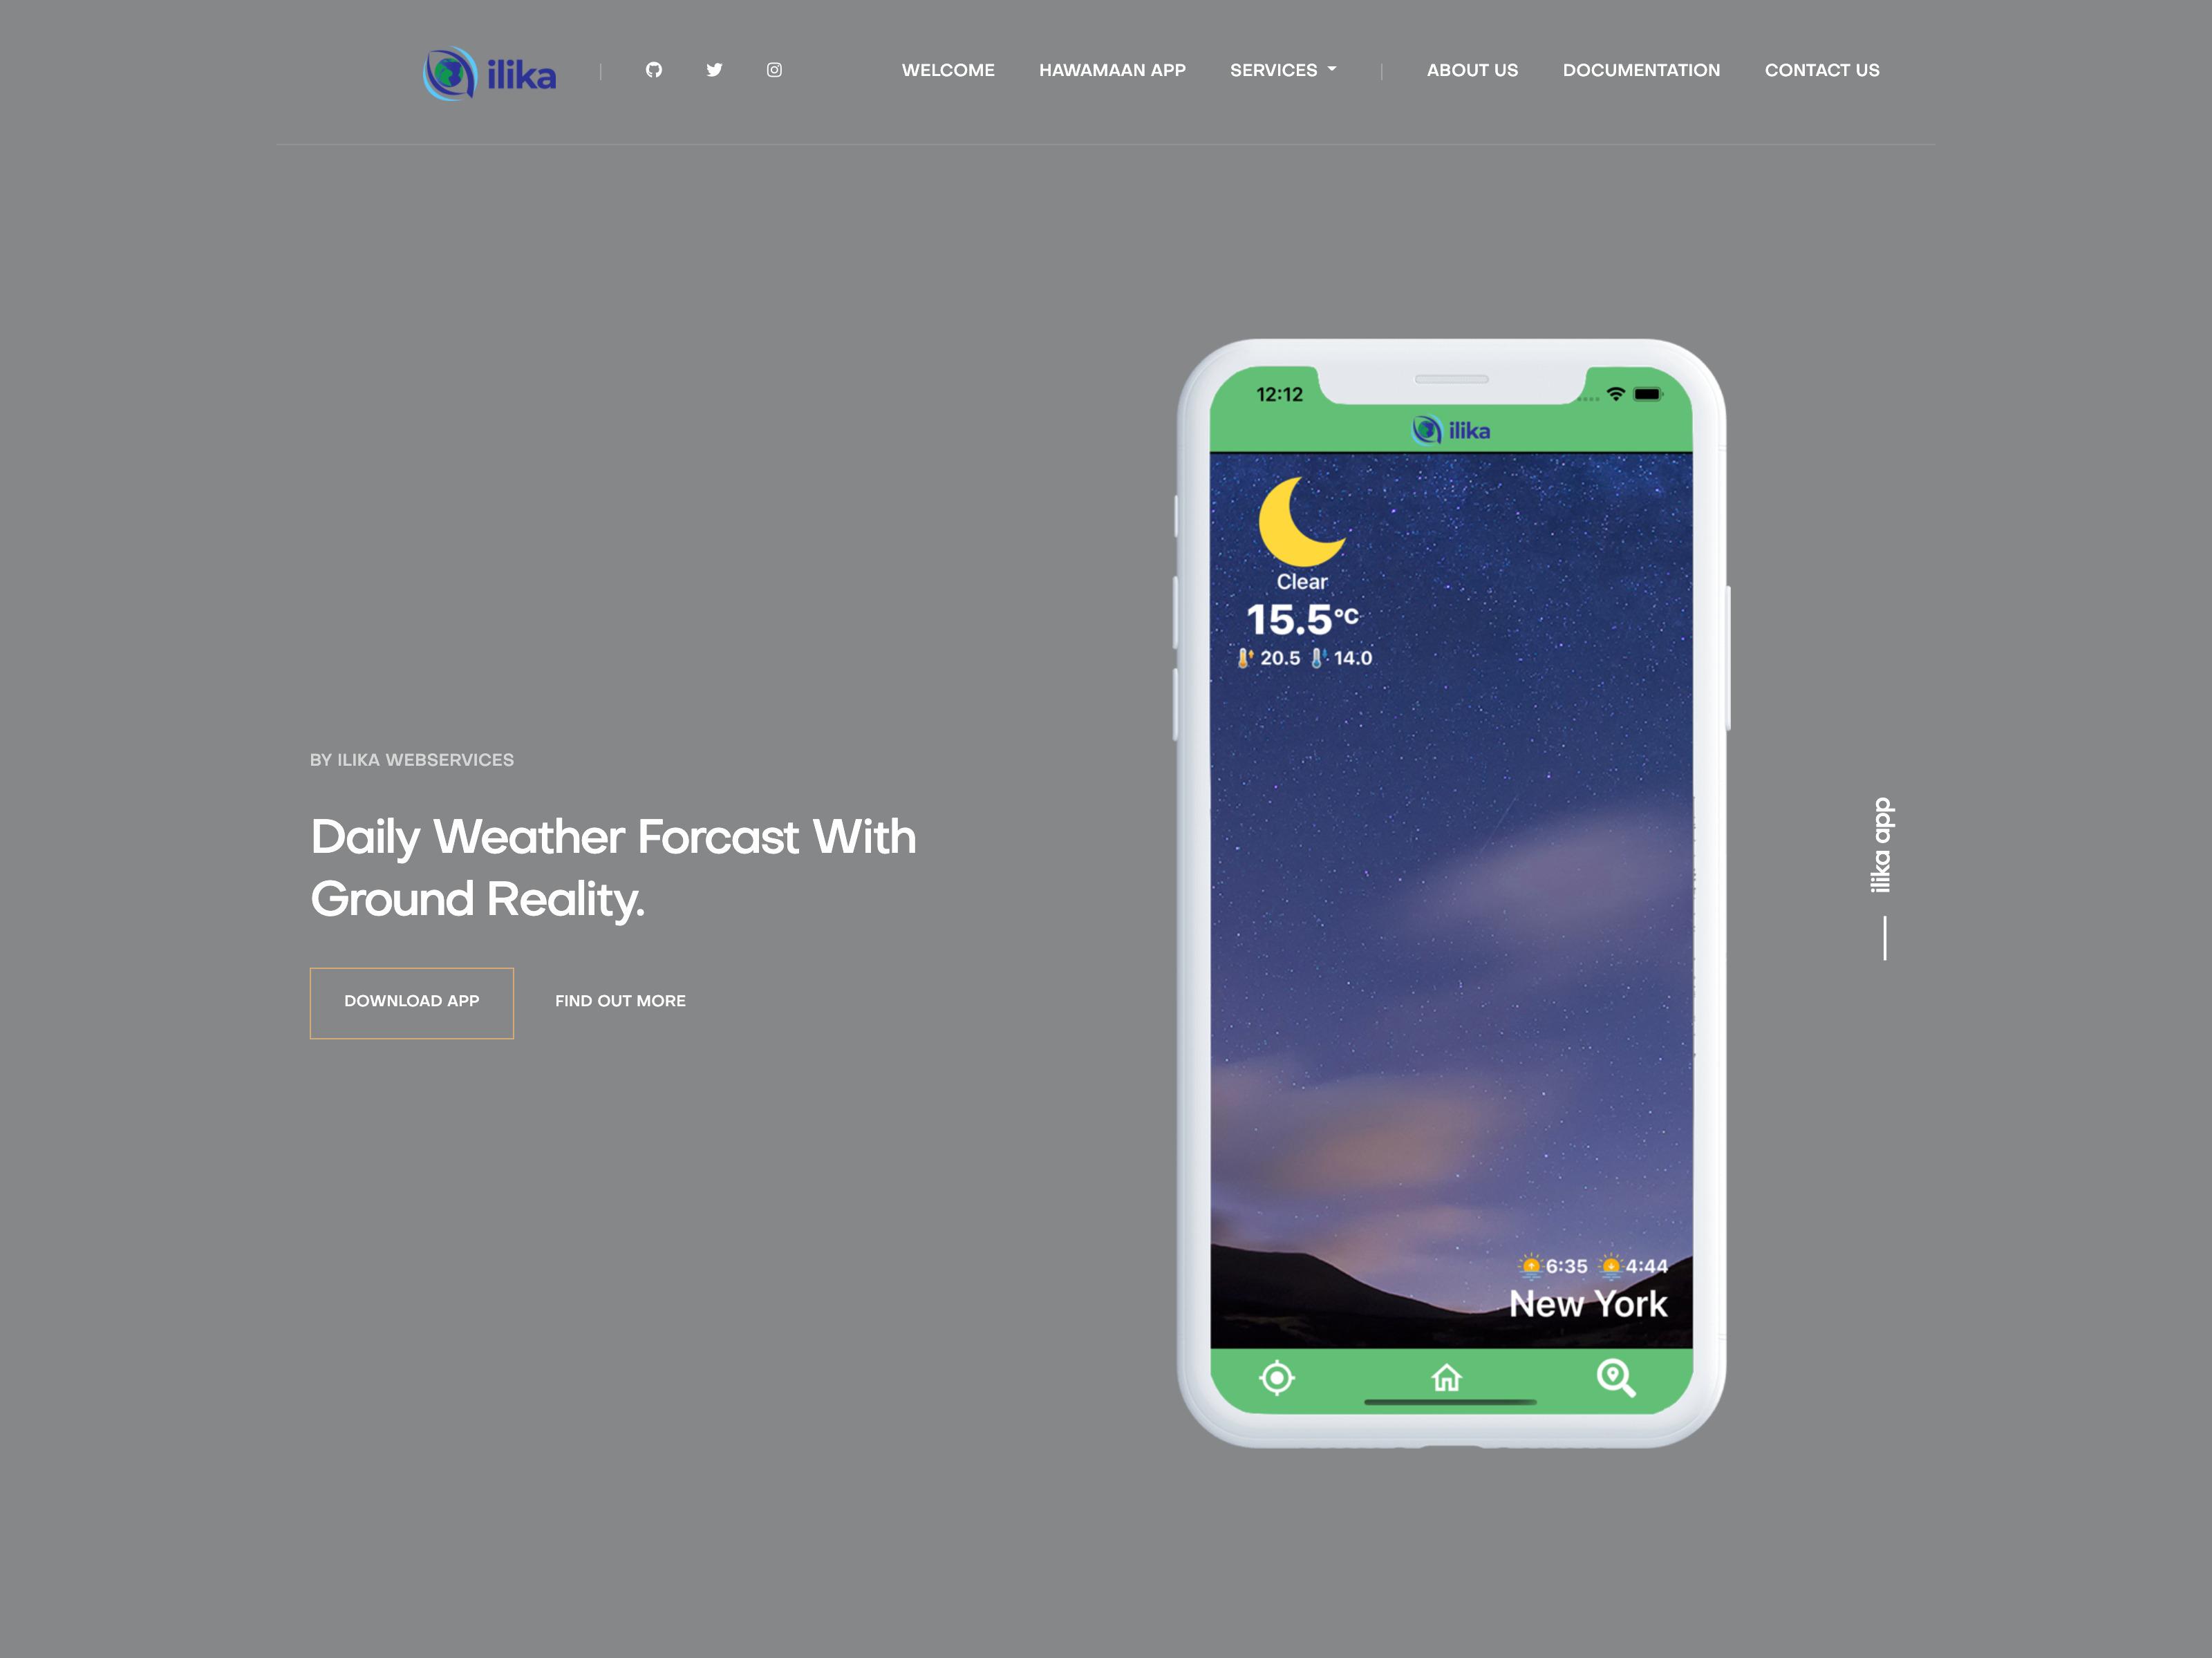 Hawamaan App